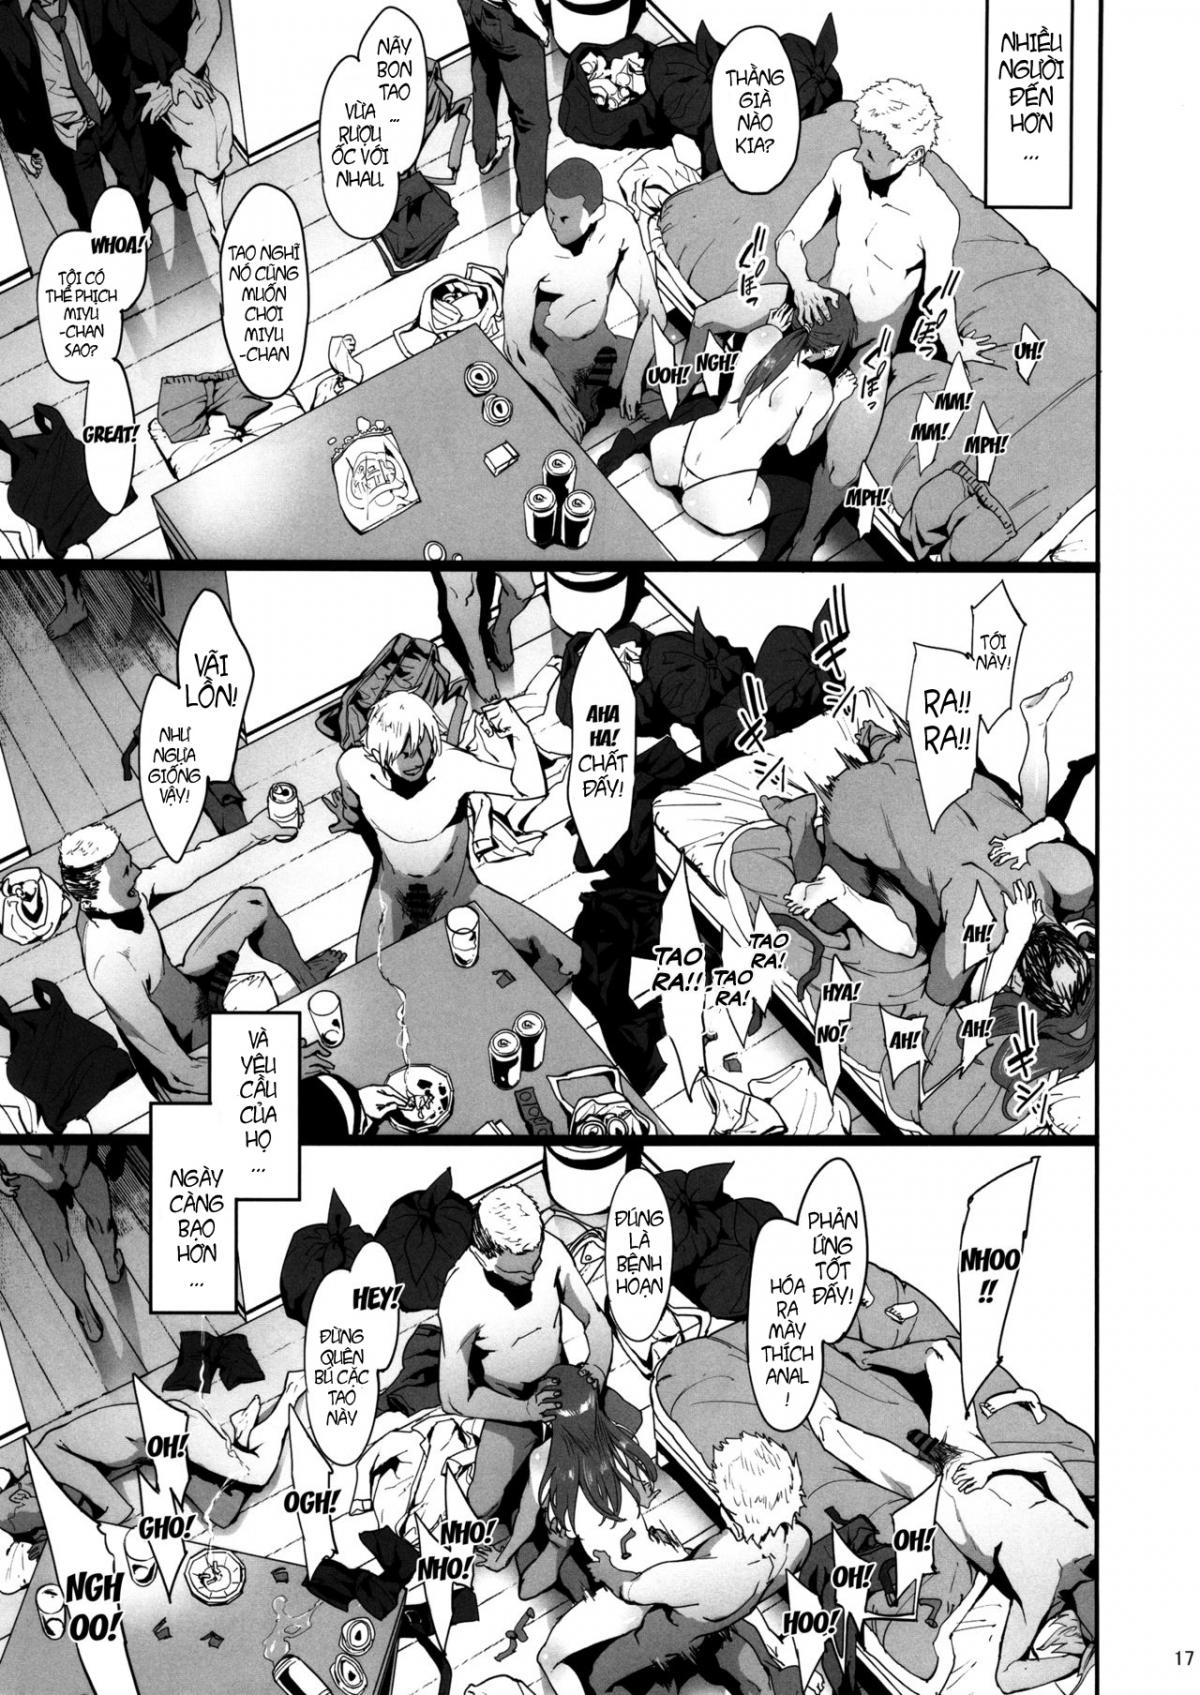 Hình ảnh  trong bài viết Mifune Miyu no Koukai